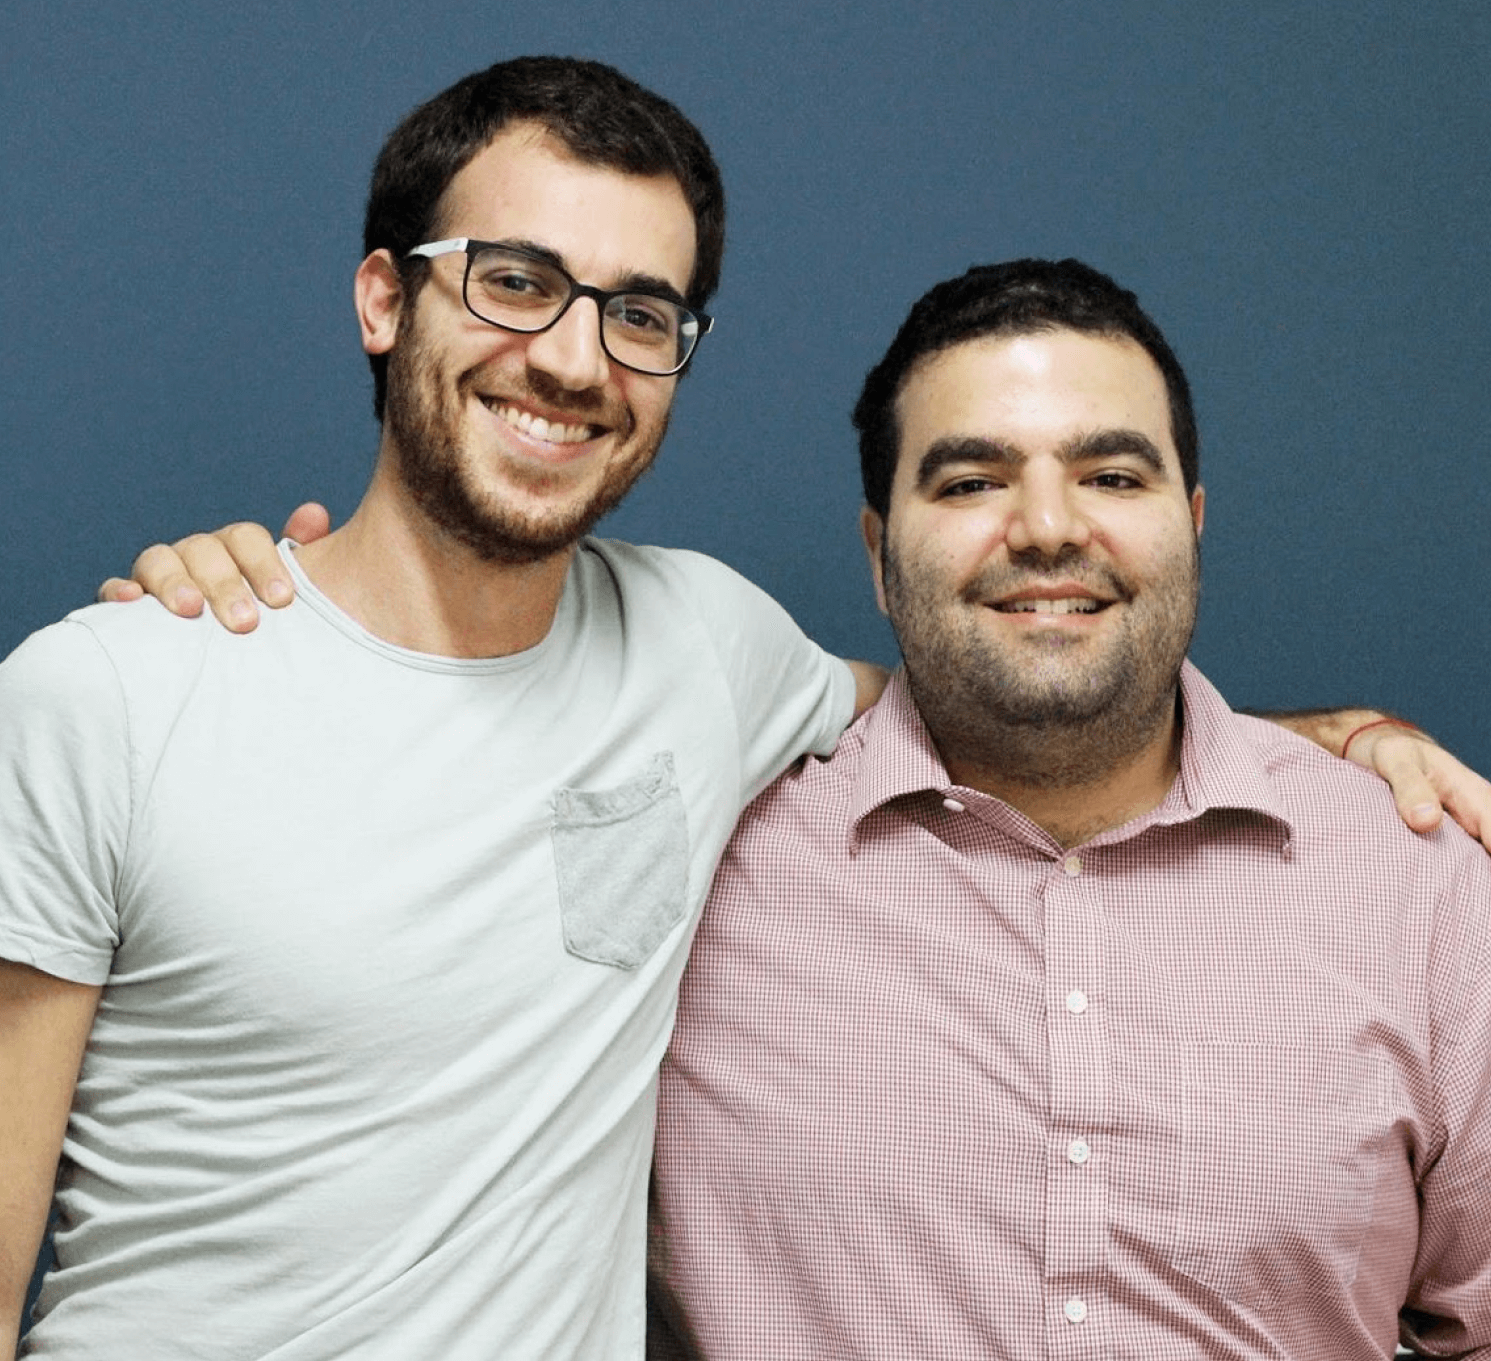 image of Co-founders David Barlev and Adam Sumner